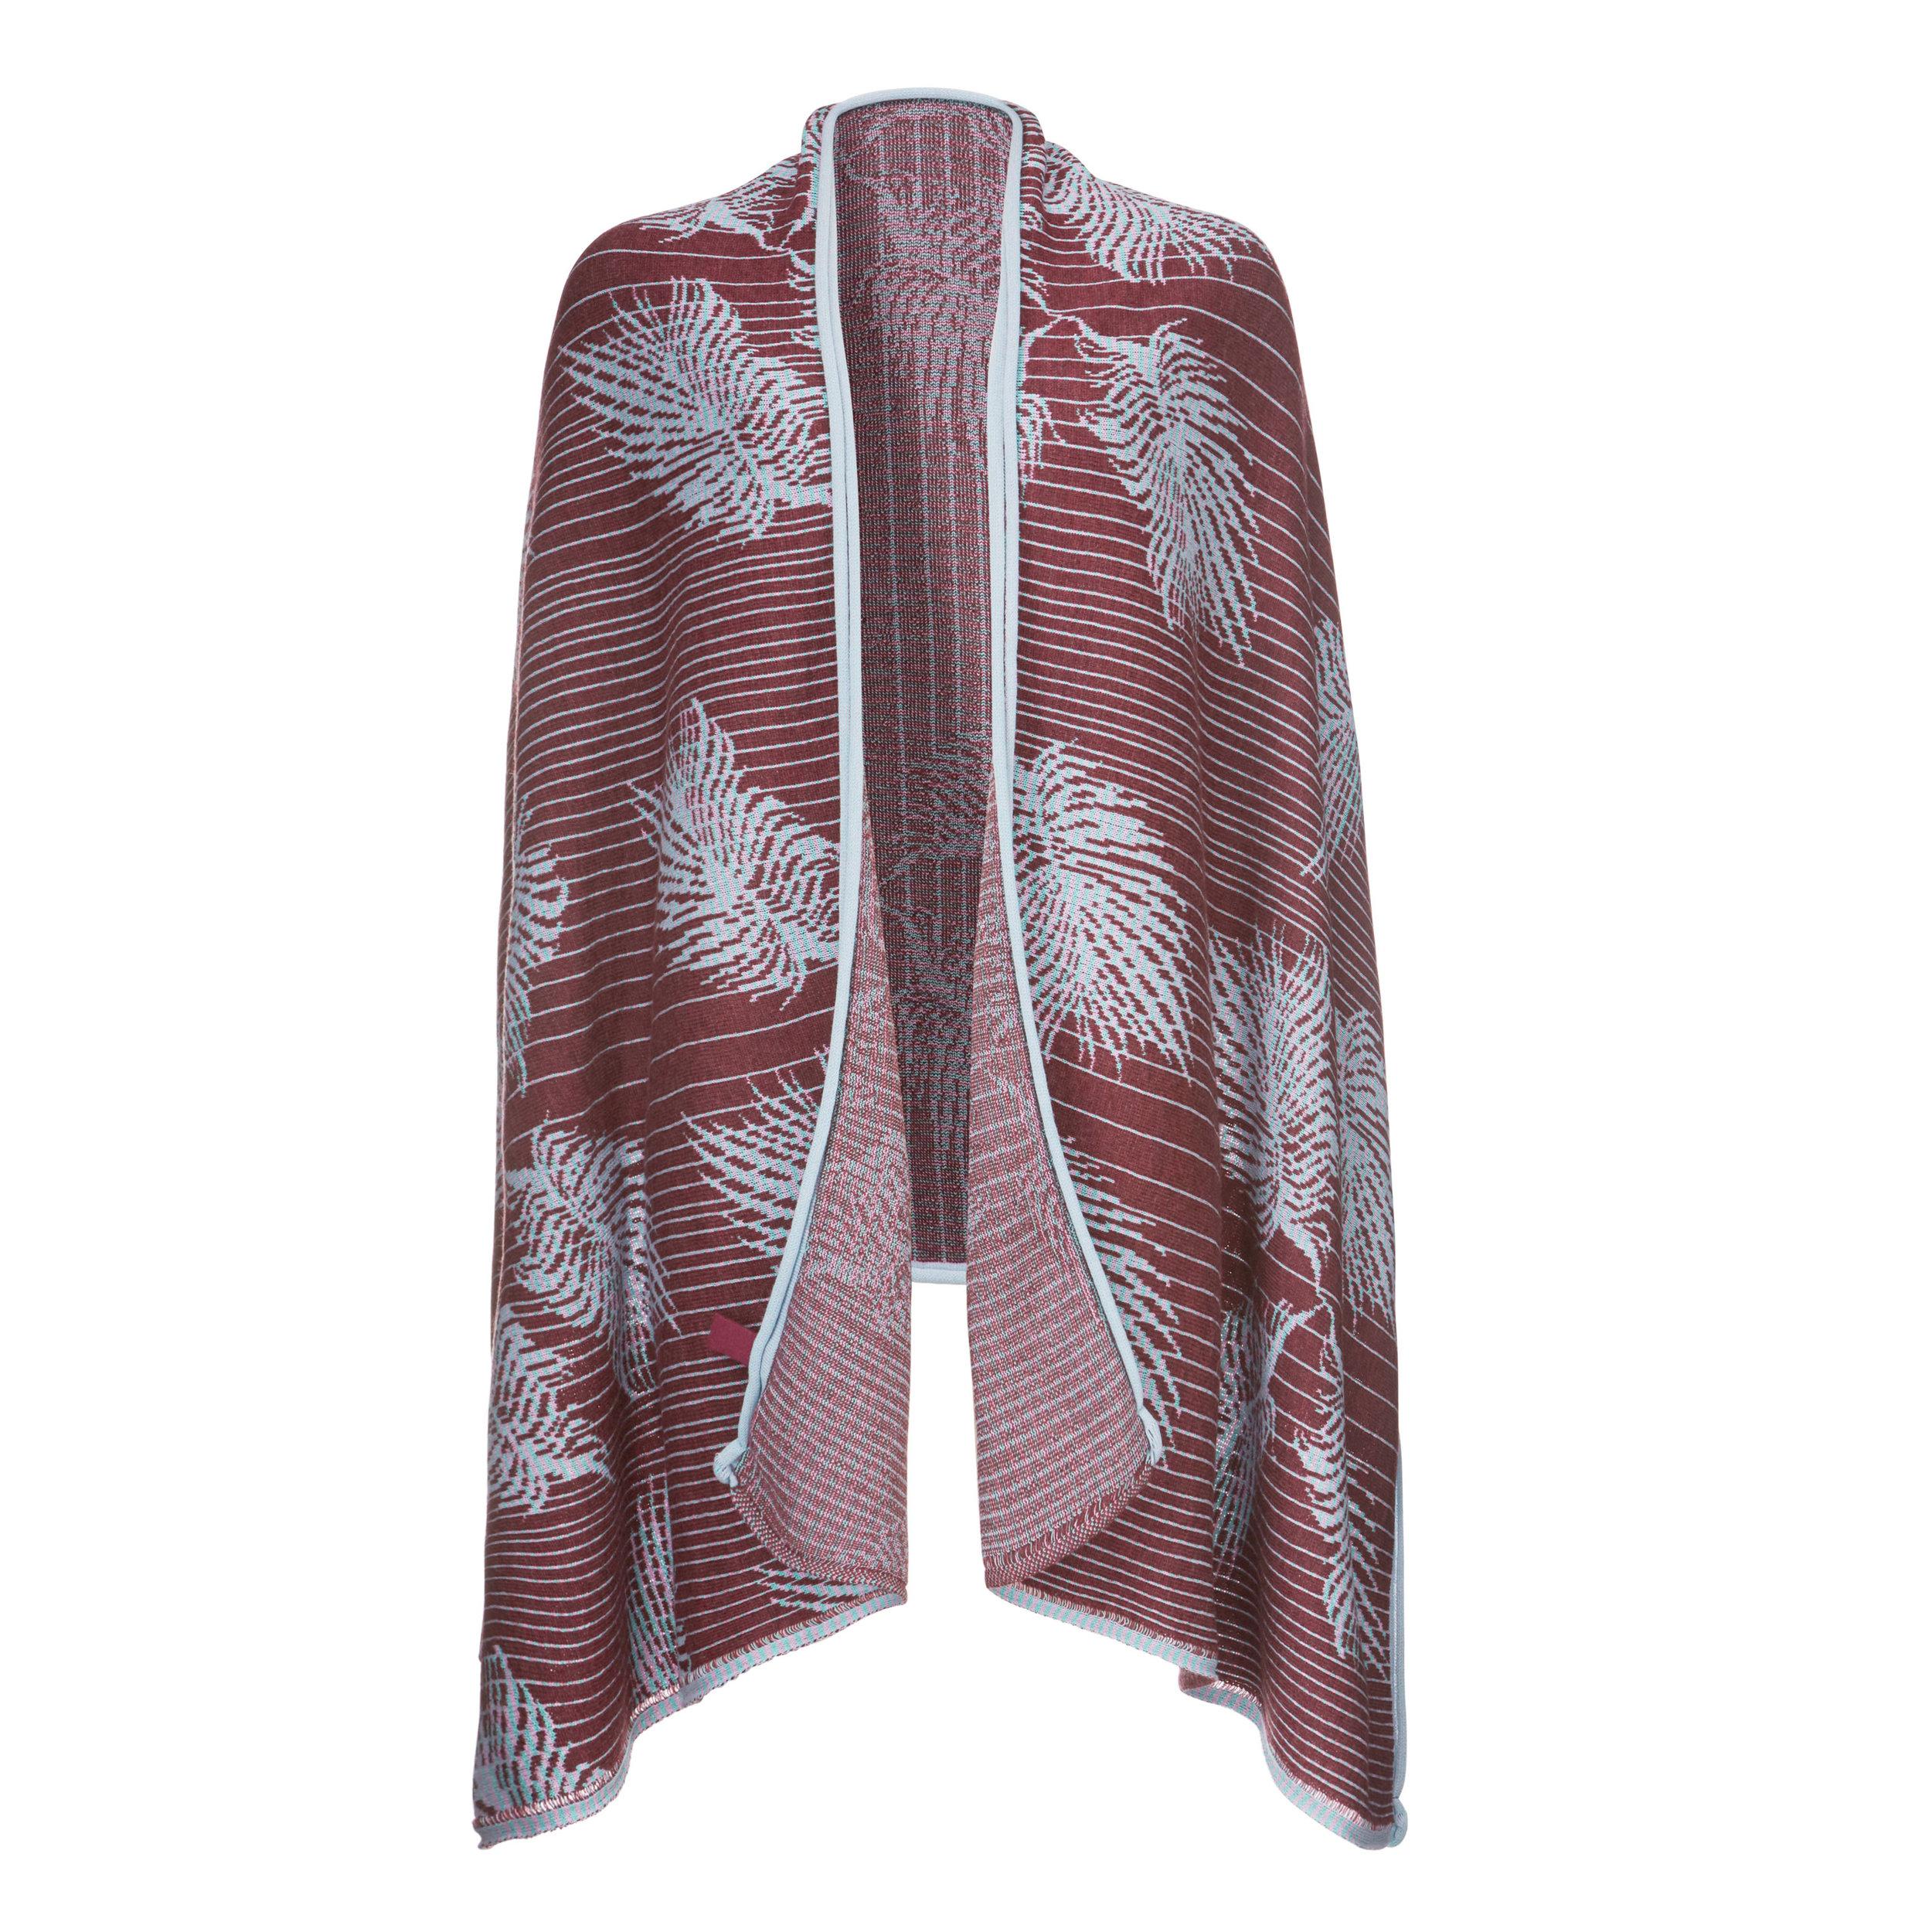 KIMONO SCARF > INHOUSE JACQUARD KNITTED  Vintage pre-digital knitted fabric, Jacquard tech, merino wool